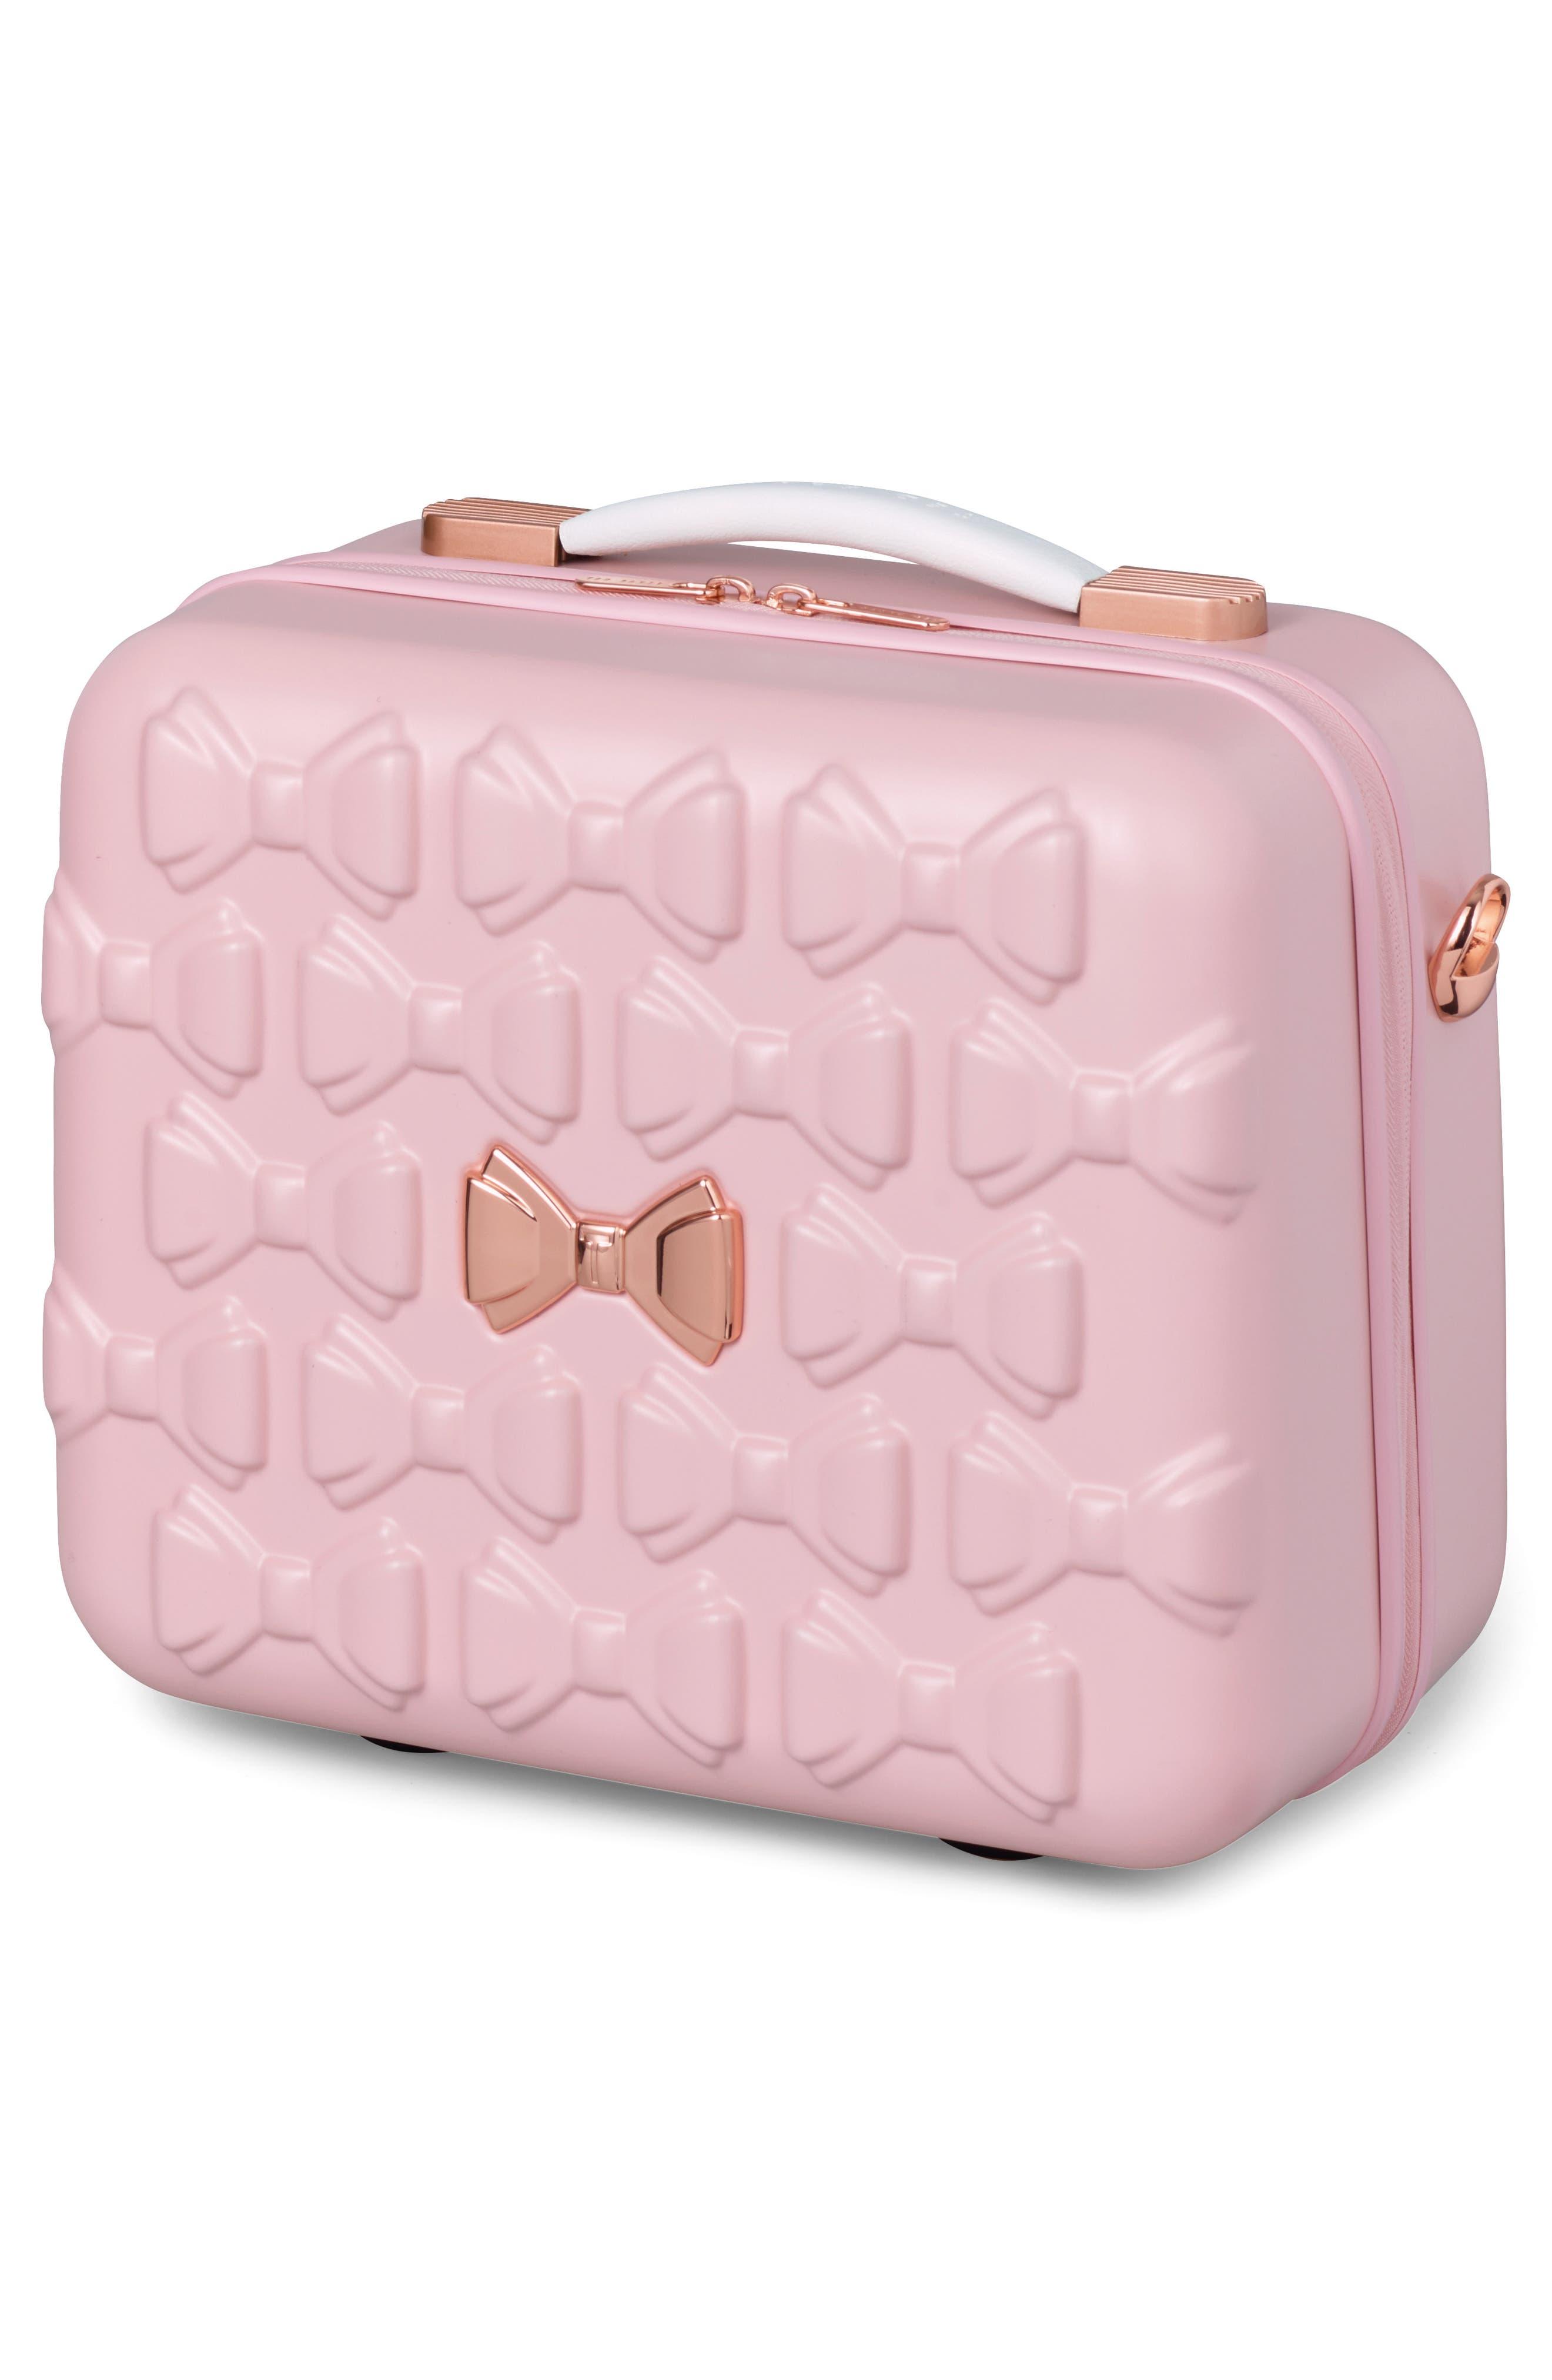 Beau Hardshell Vanity Case,                             Alternate thumbnail 4, color,                             Pink